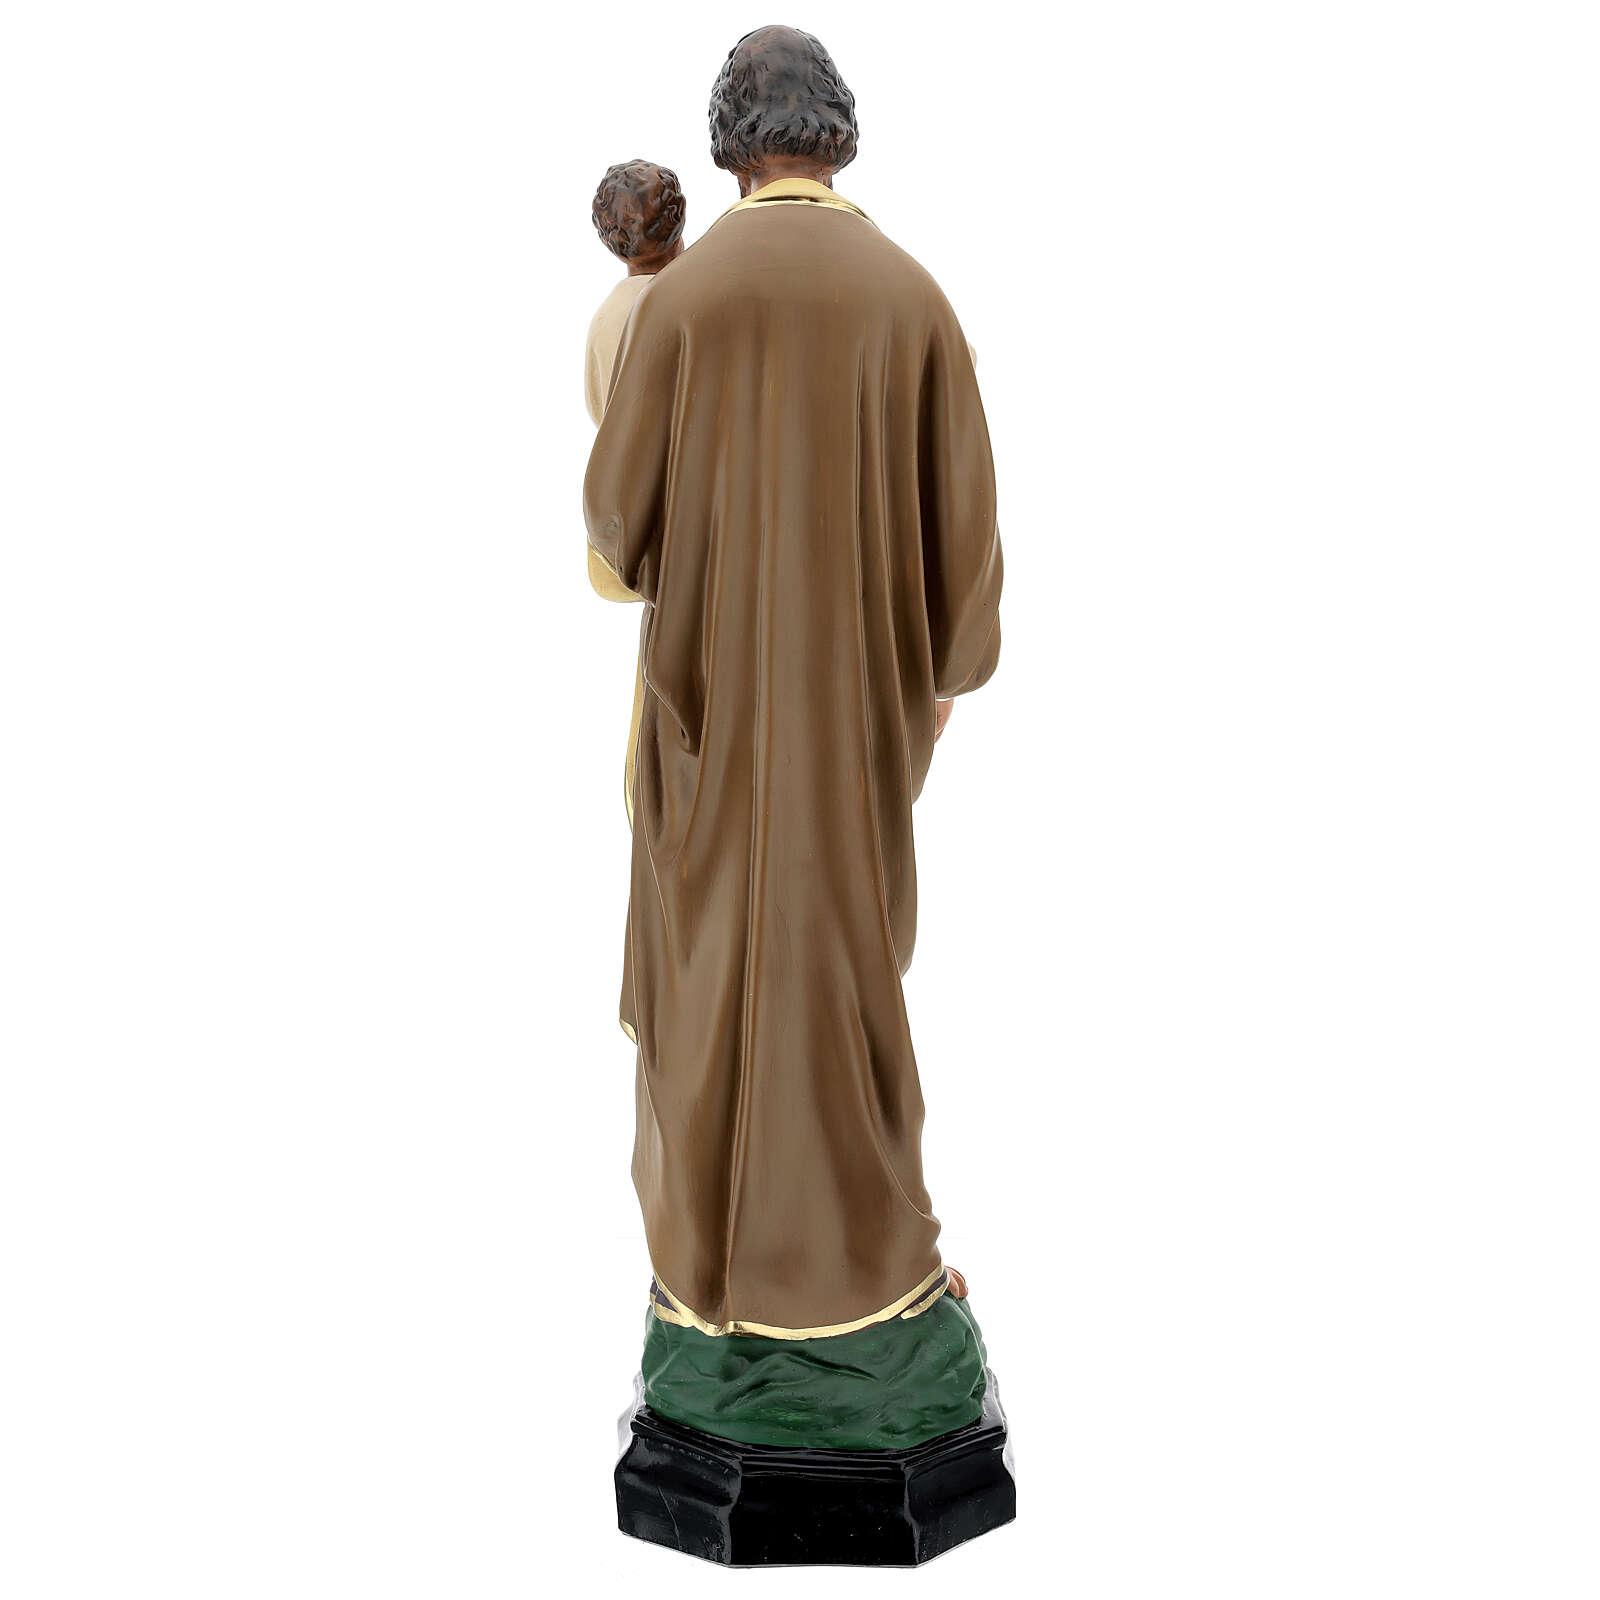 Statue of St Joseph and Child Jesus, 65 cm hand painted resin Arte Barsanti 4